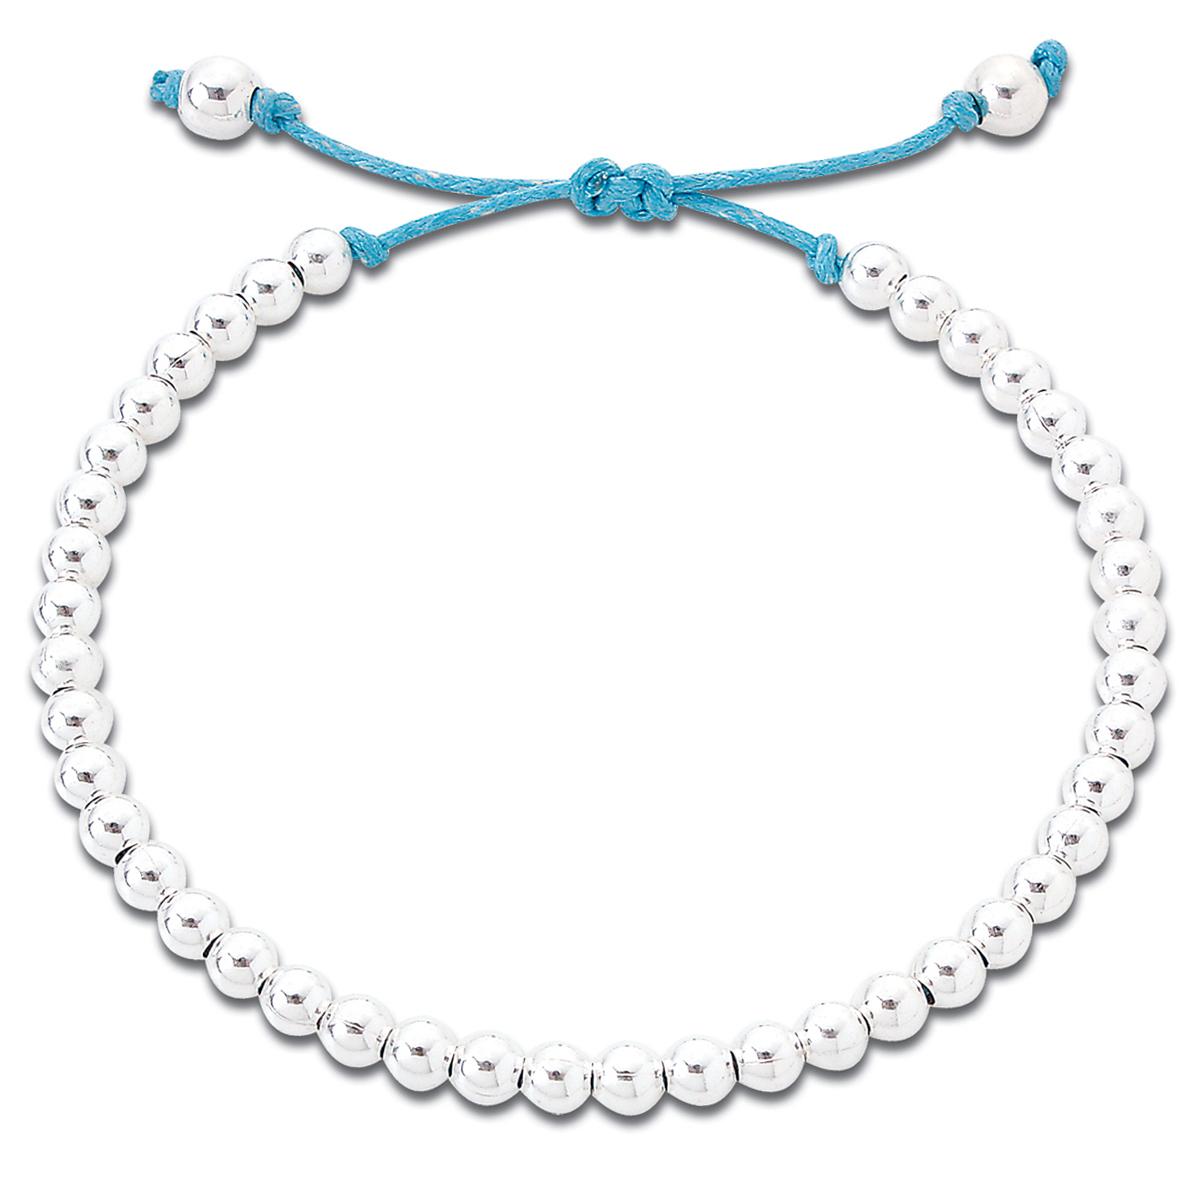 Silver Friendship Bracelet Handmade In Sterling Silver